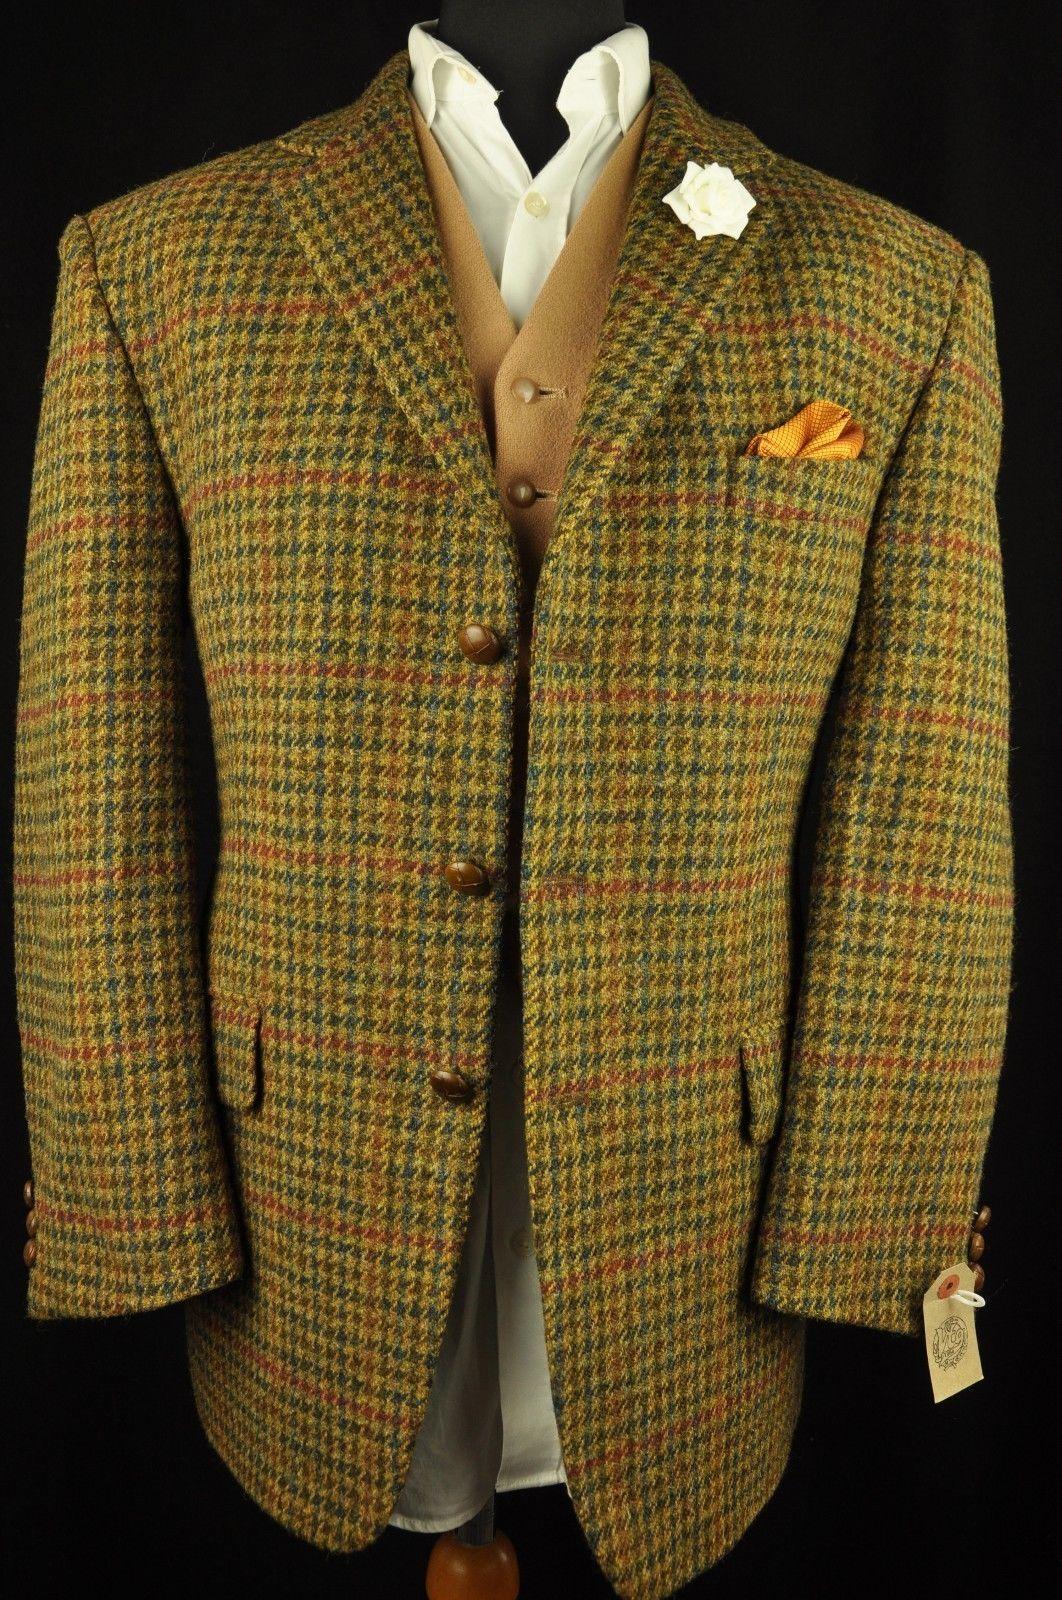 Veste en tweed homme sur mesure